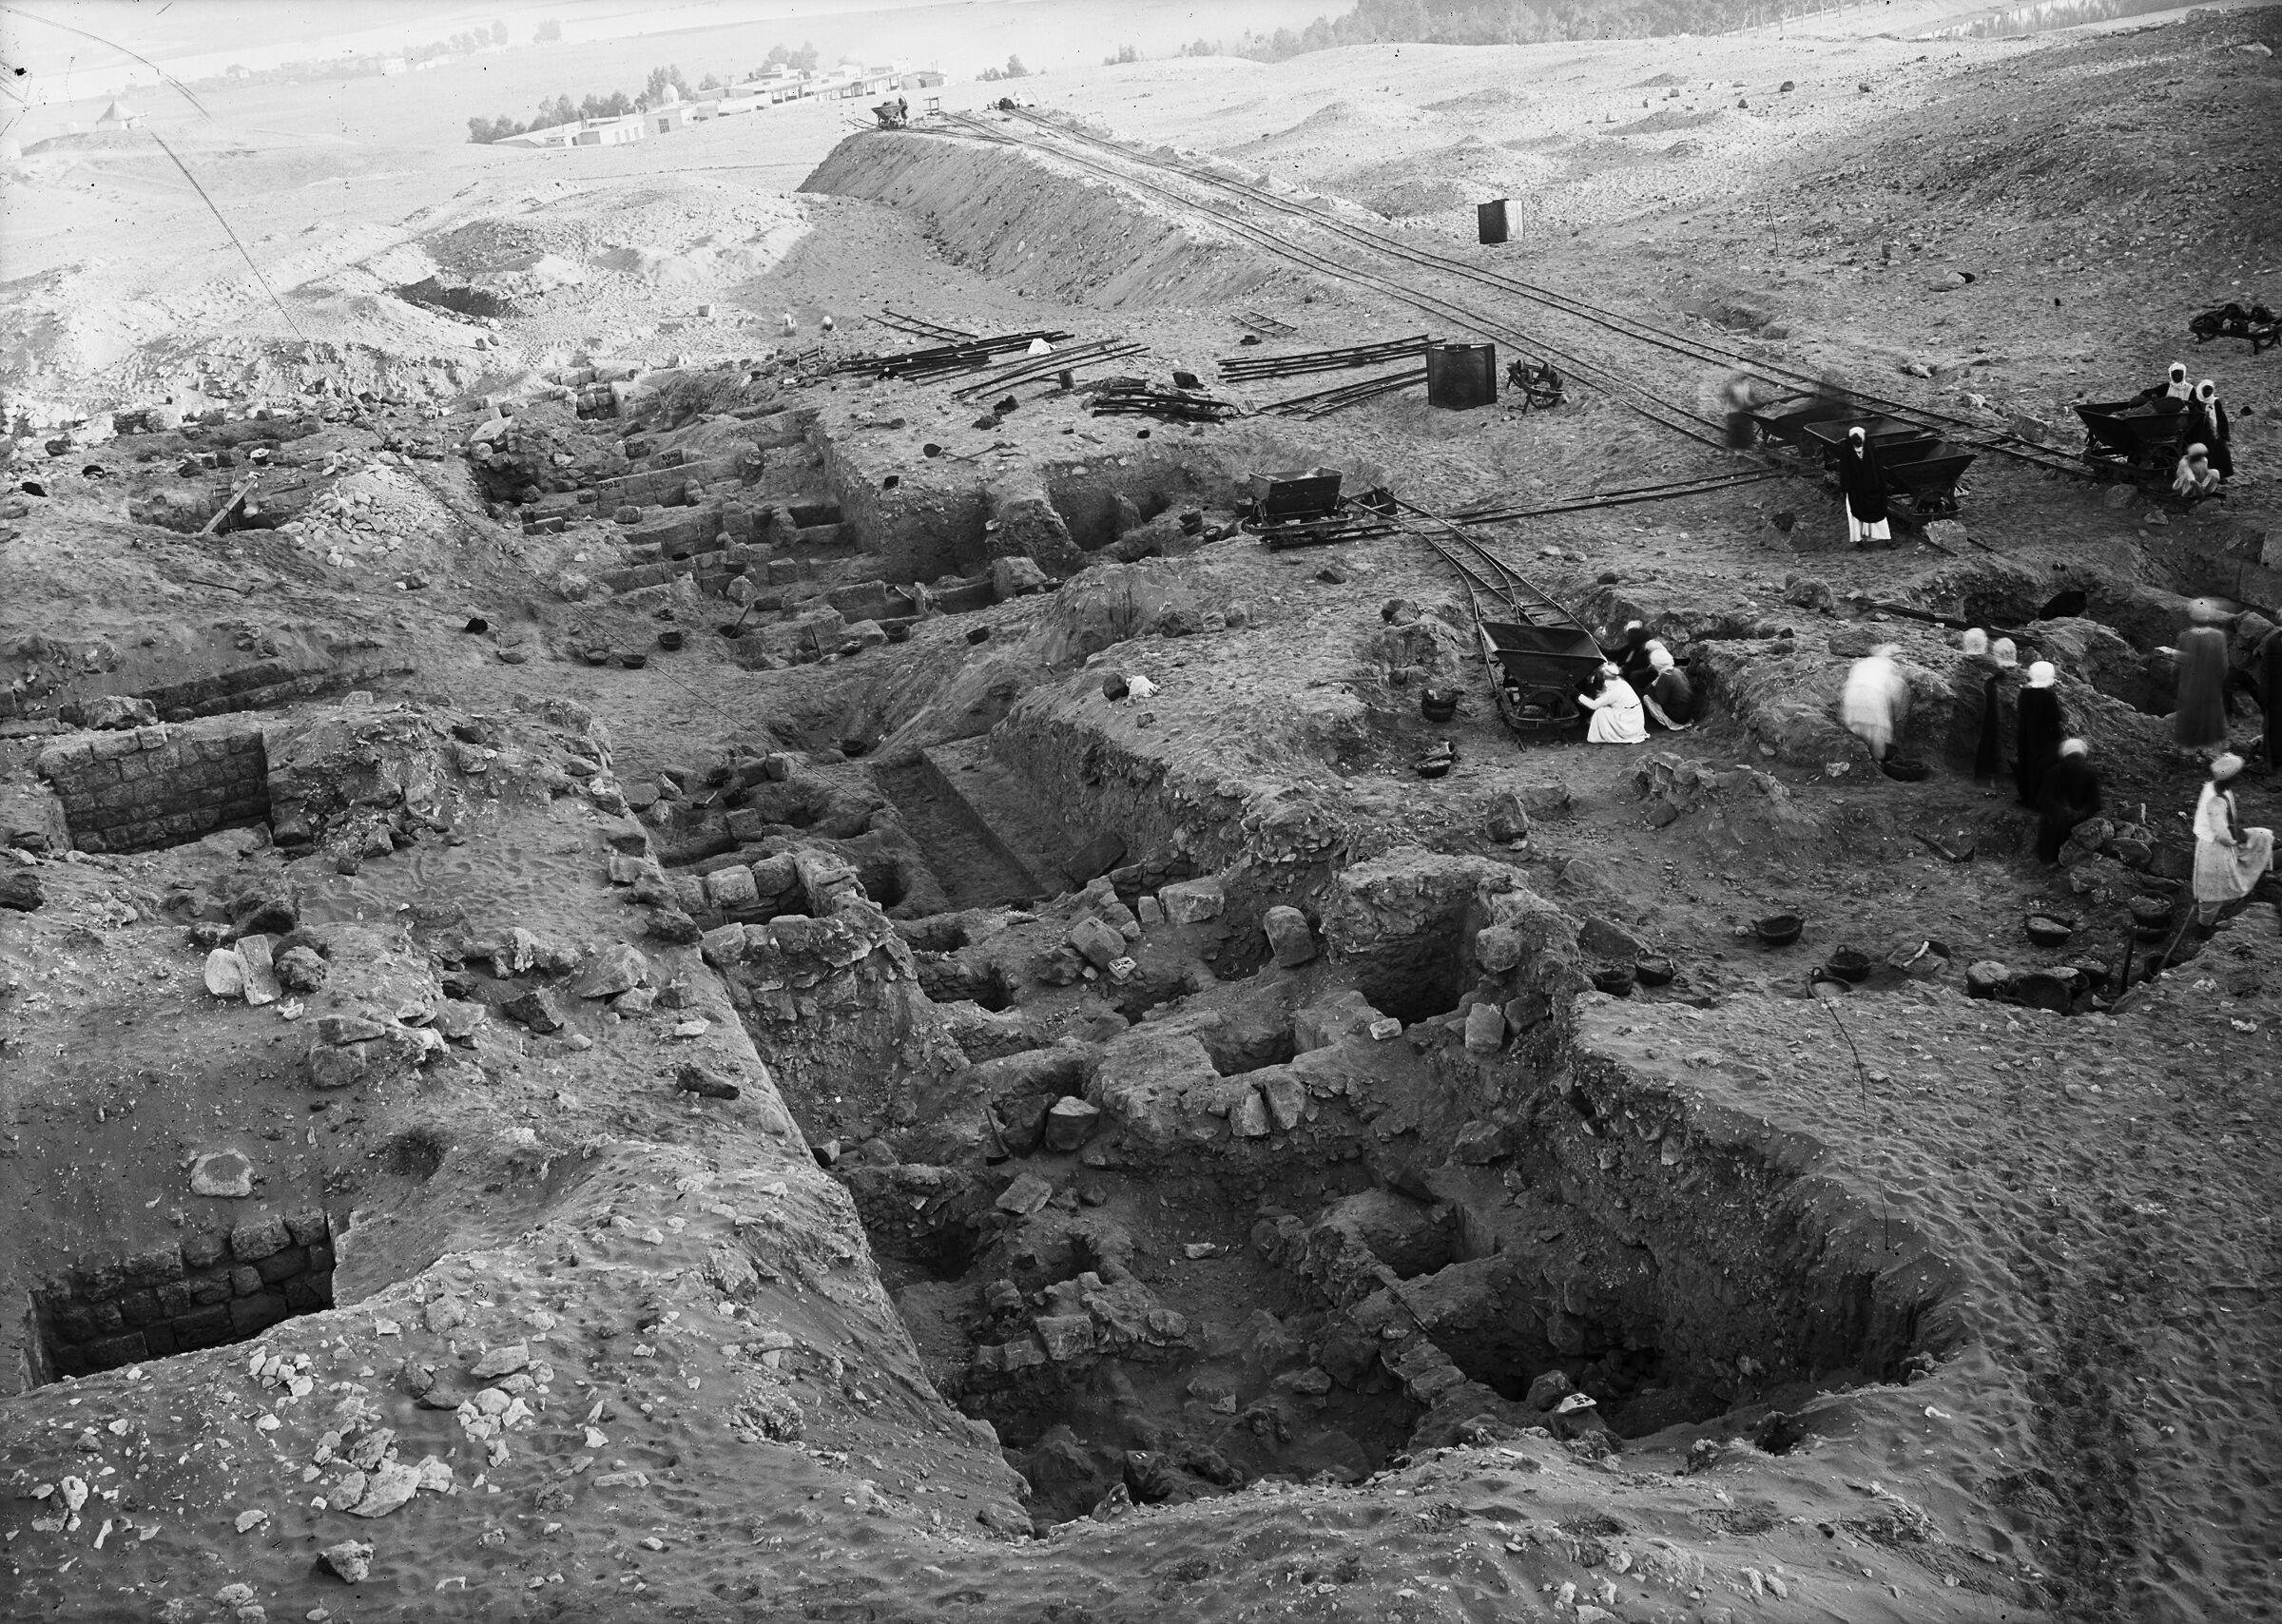 Western Cemetery: Site: Giza; View: G 2311, G 2312, G 2310 = G 5180, G 2320 = G 5280, G 2300 = G 5190, G 2350 = G 5290, G 2313, G 2304, G 2302